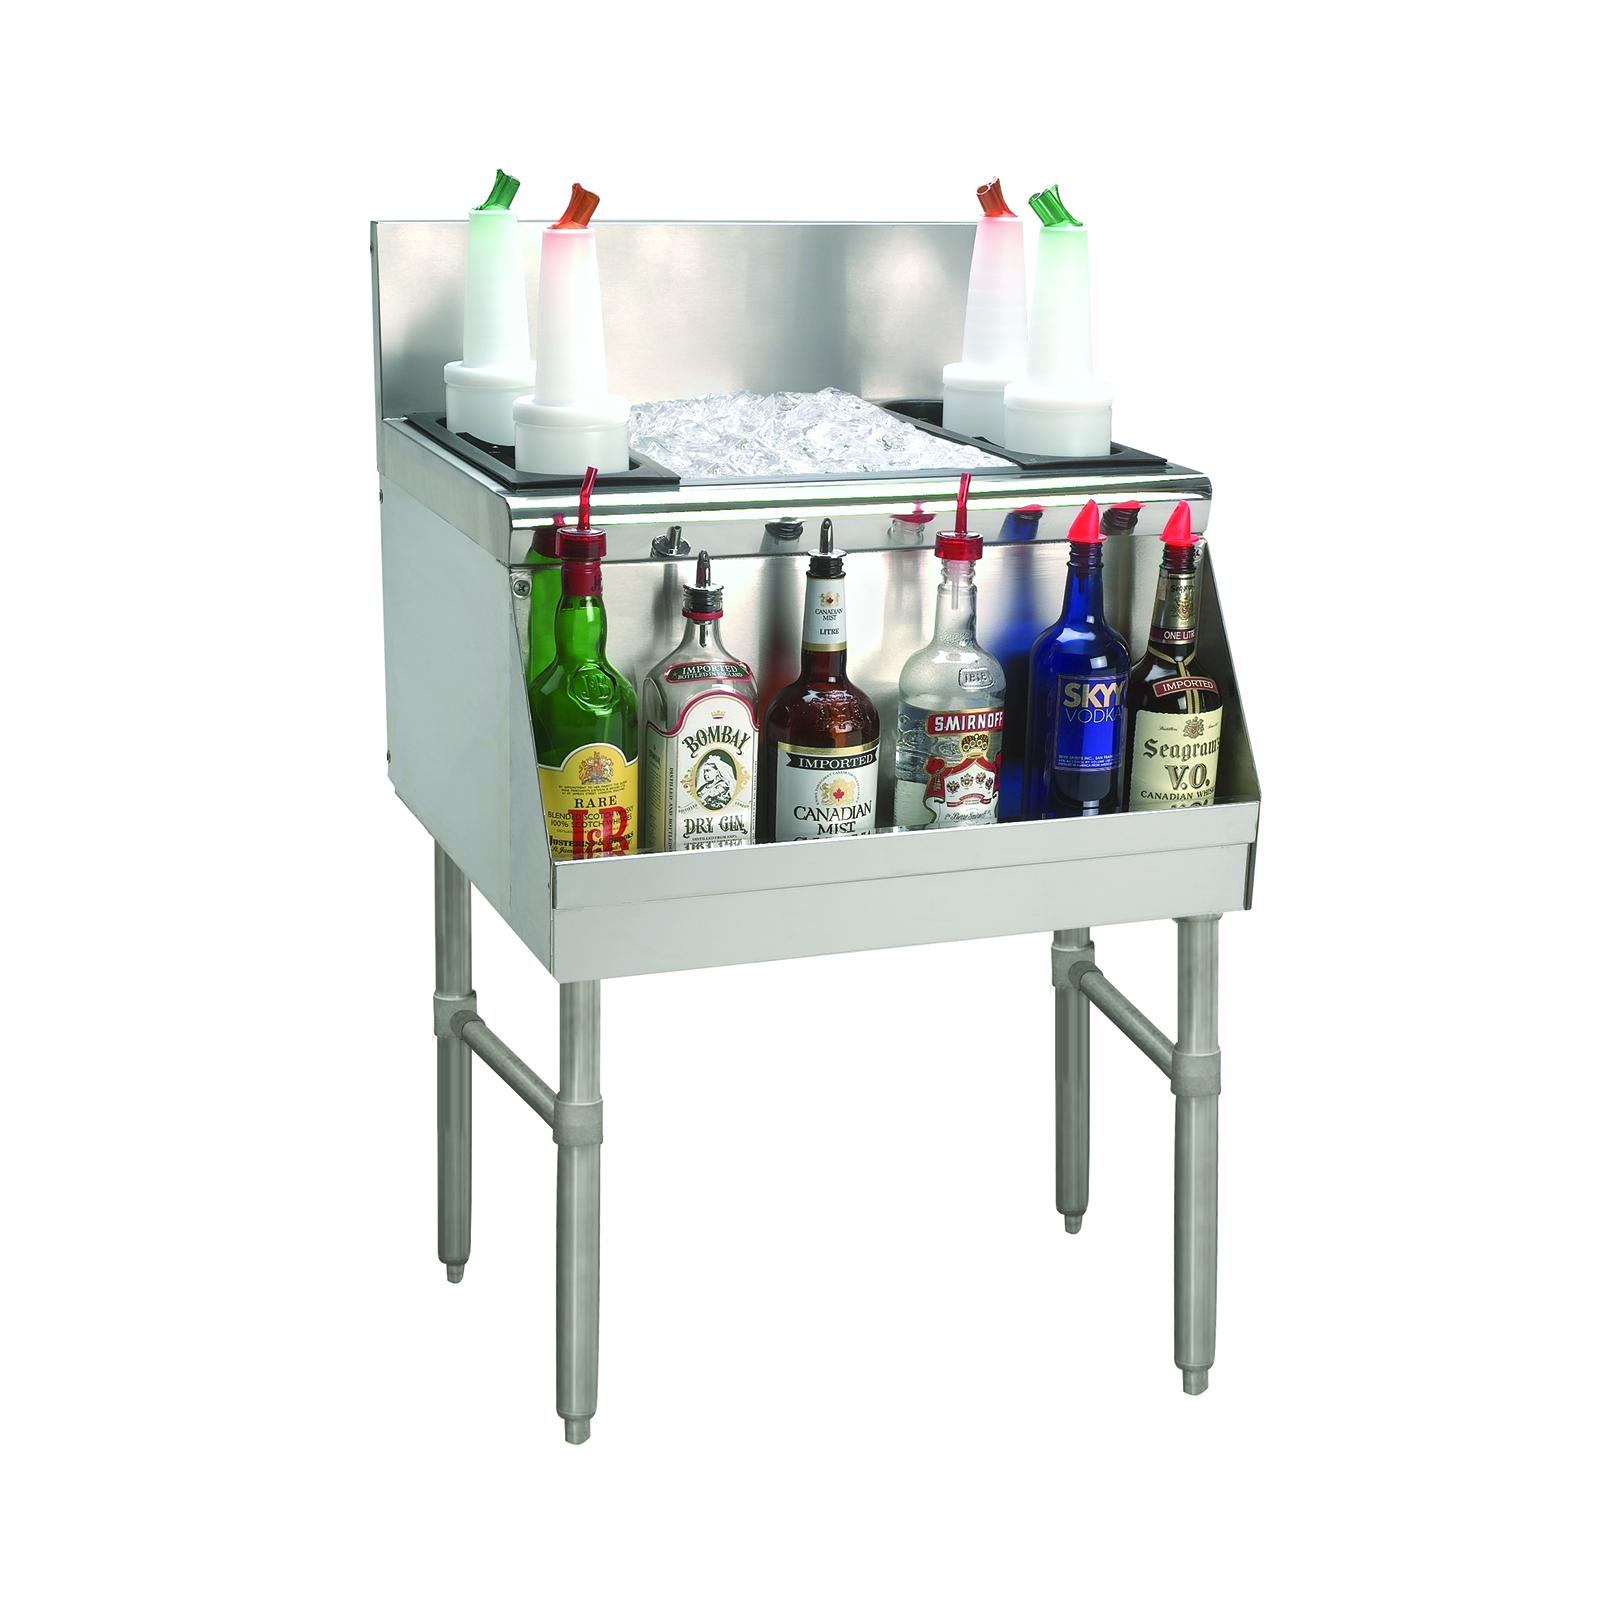 Advance Tabco PRI-24-36-10D underbar ice bin/cocktail unit